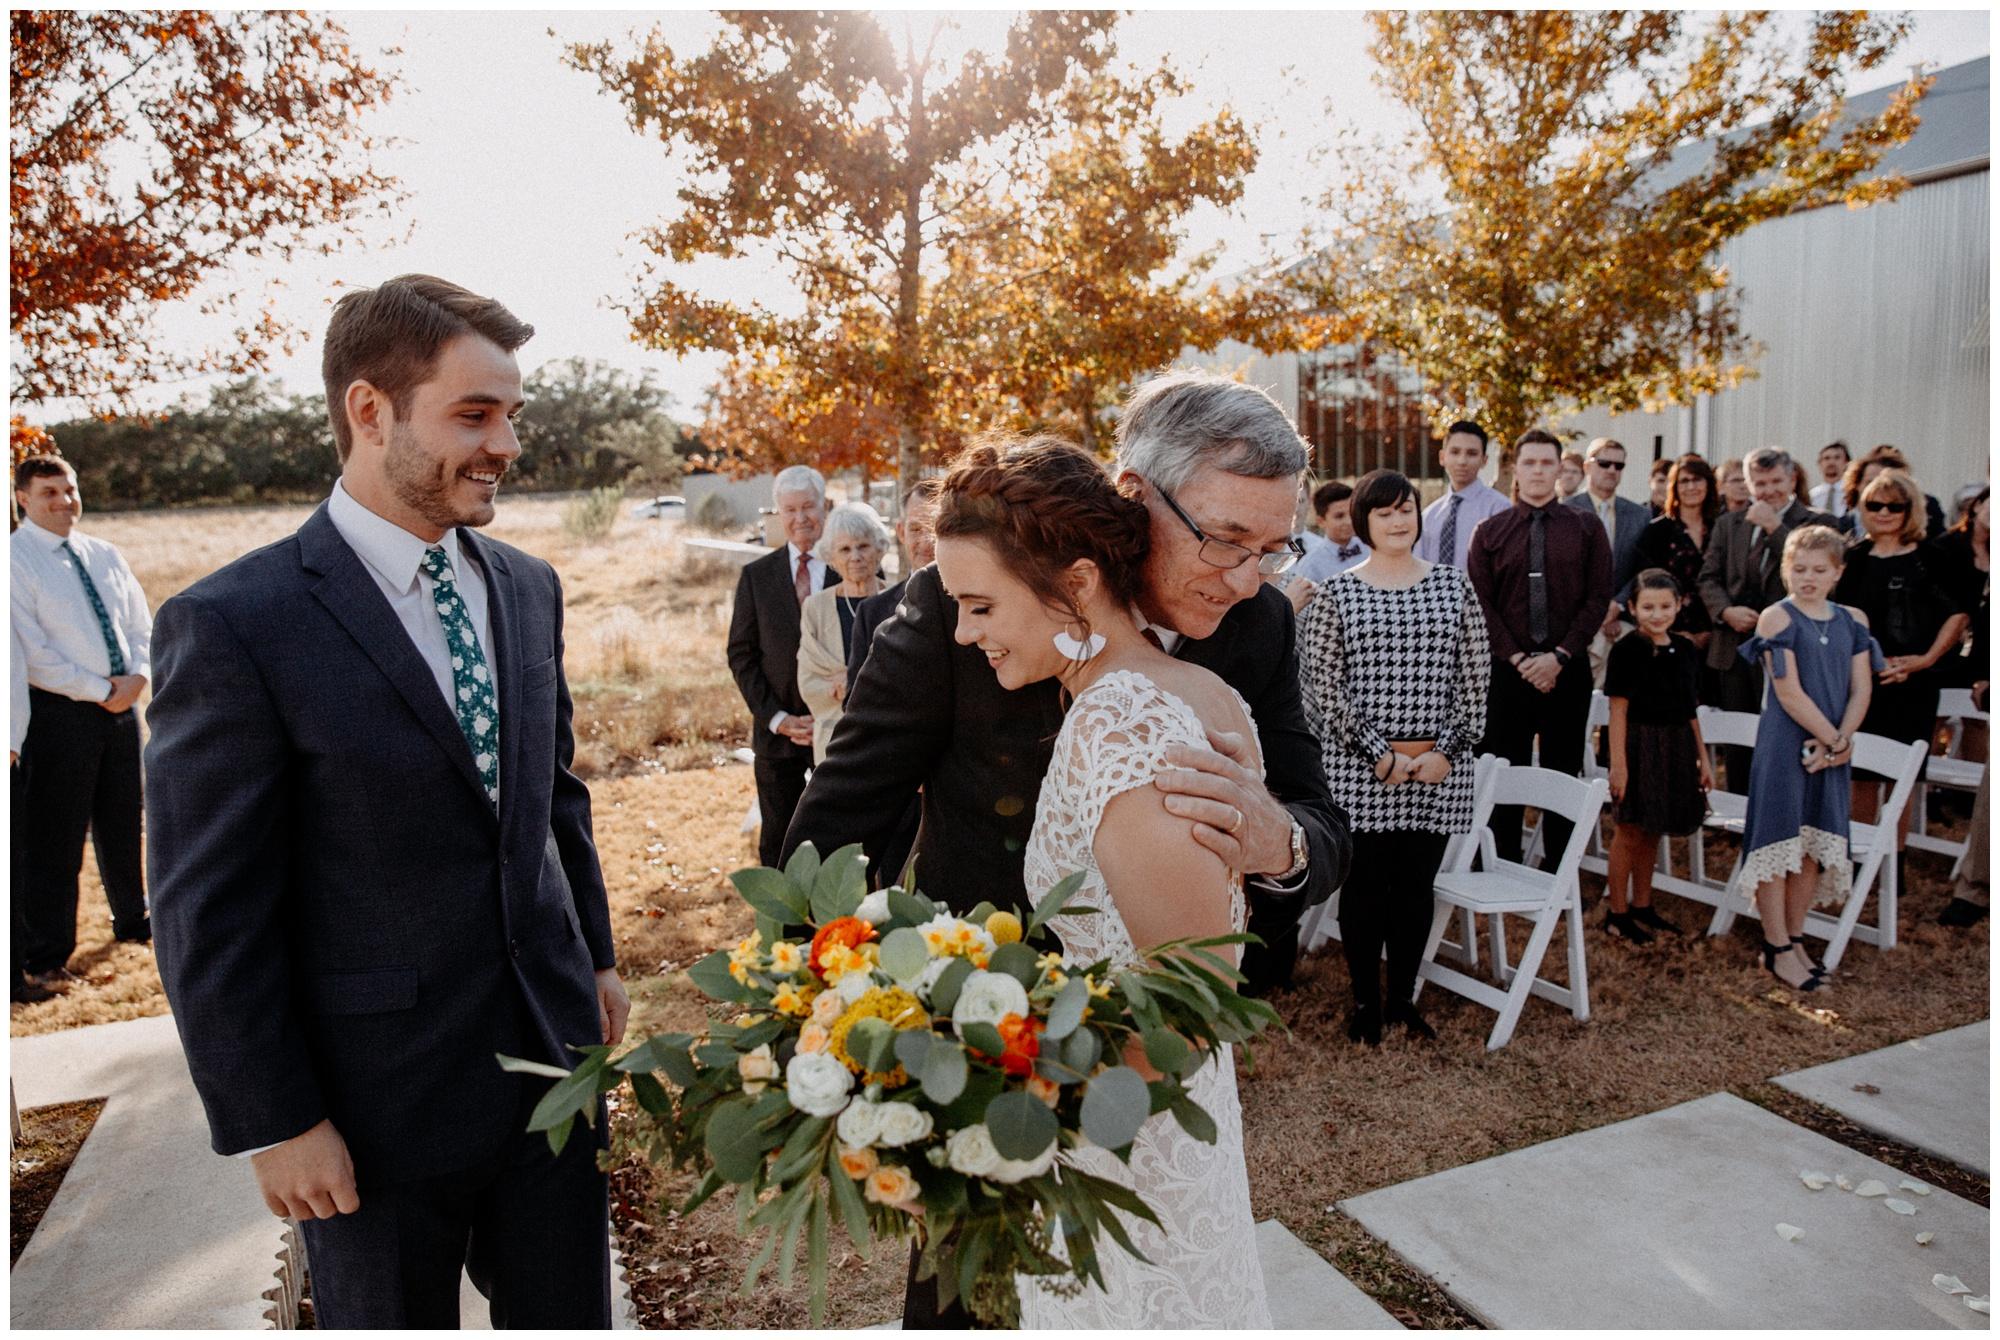 AUSTIN-TEXAS-PROSPECT-HOUSE-WEDDING-VENUE-PHOTOGRAPHY25790.JPG